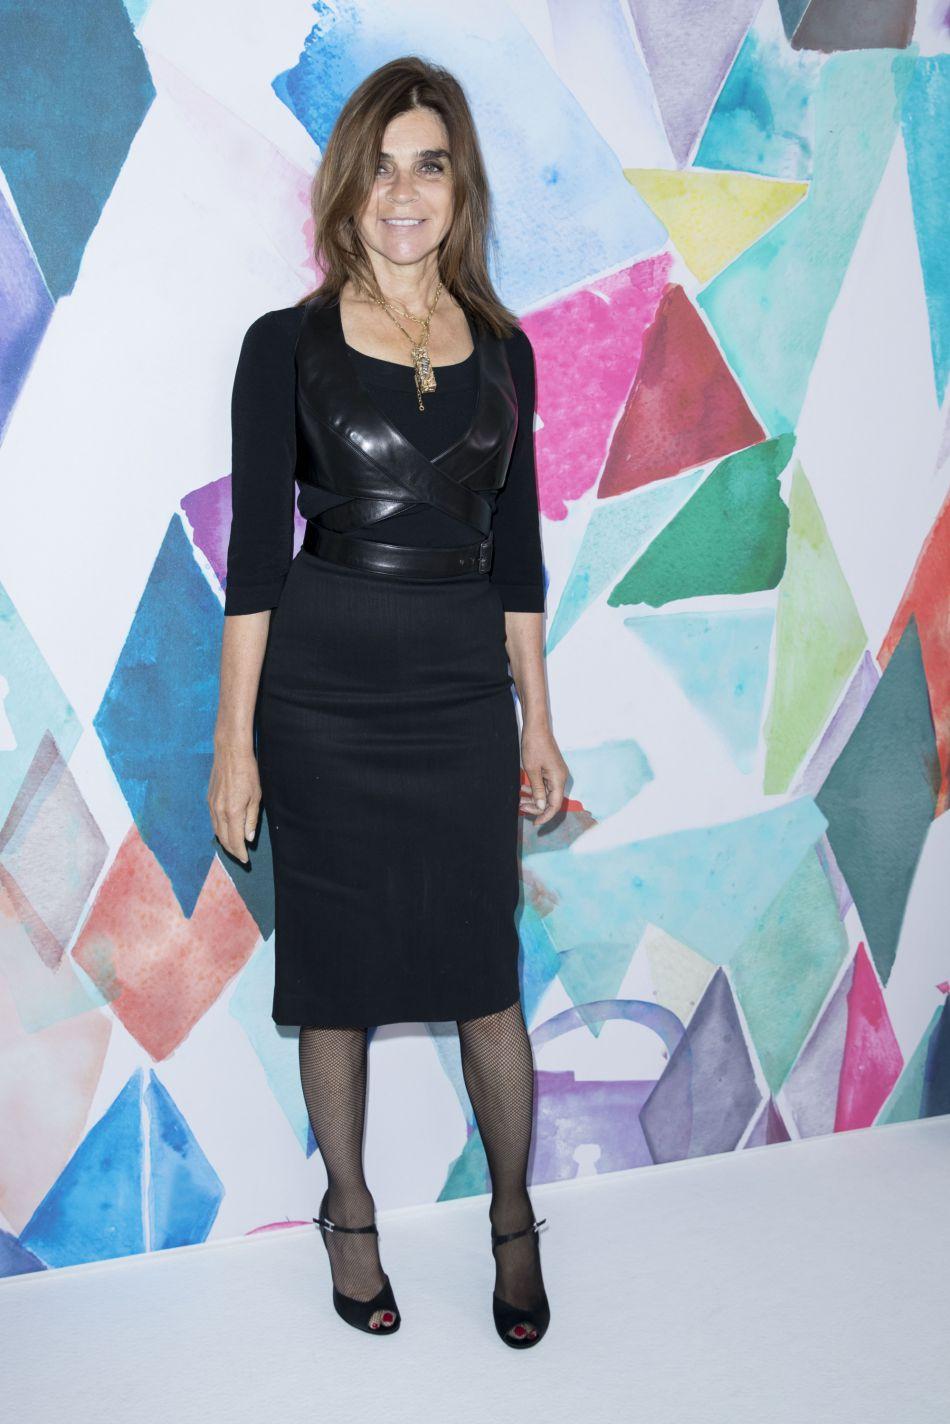 Carine Roitfeld porte un top en cuir très sexy.